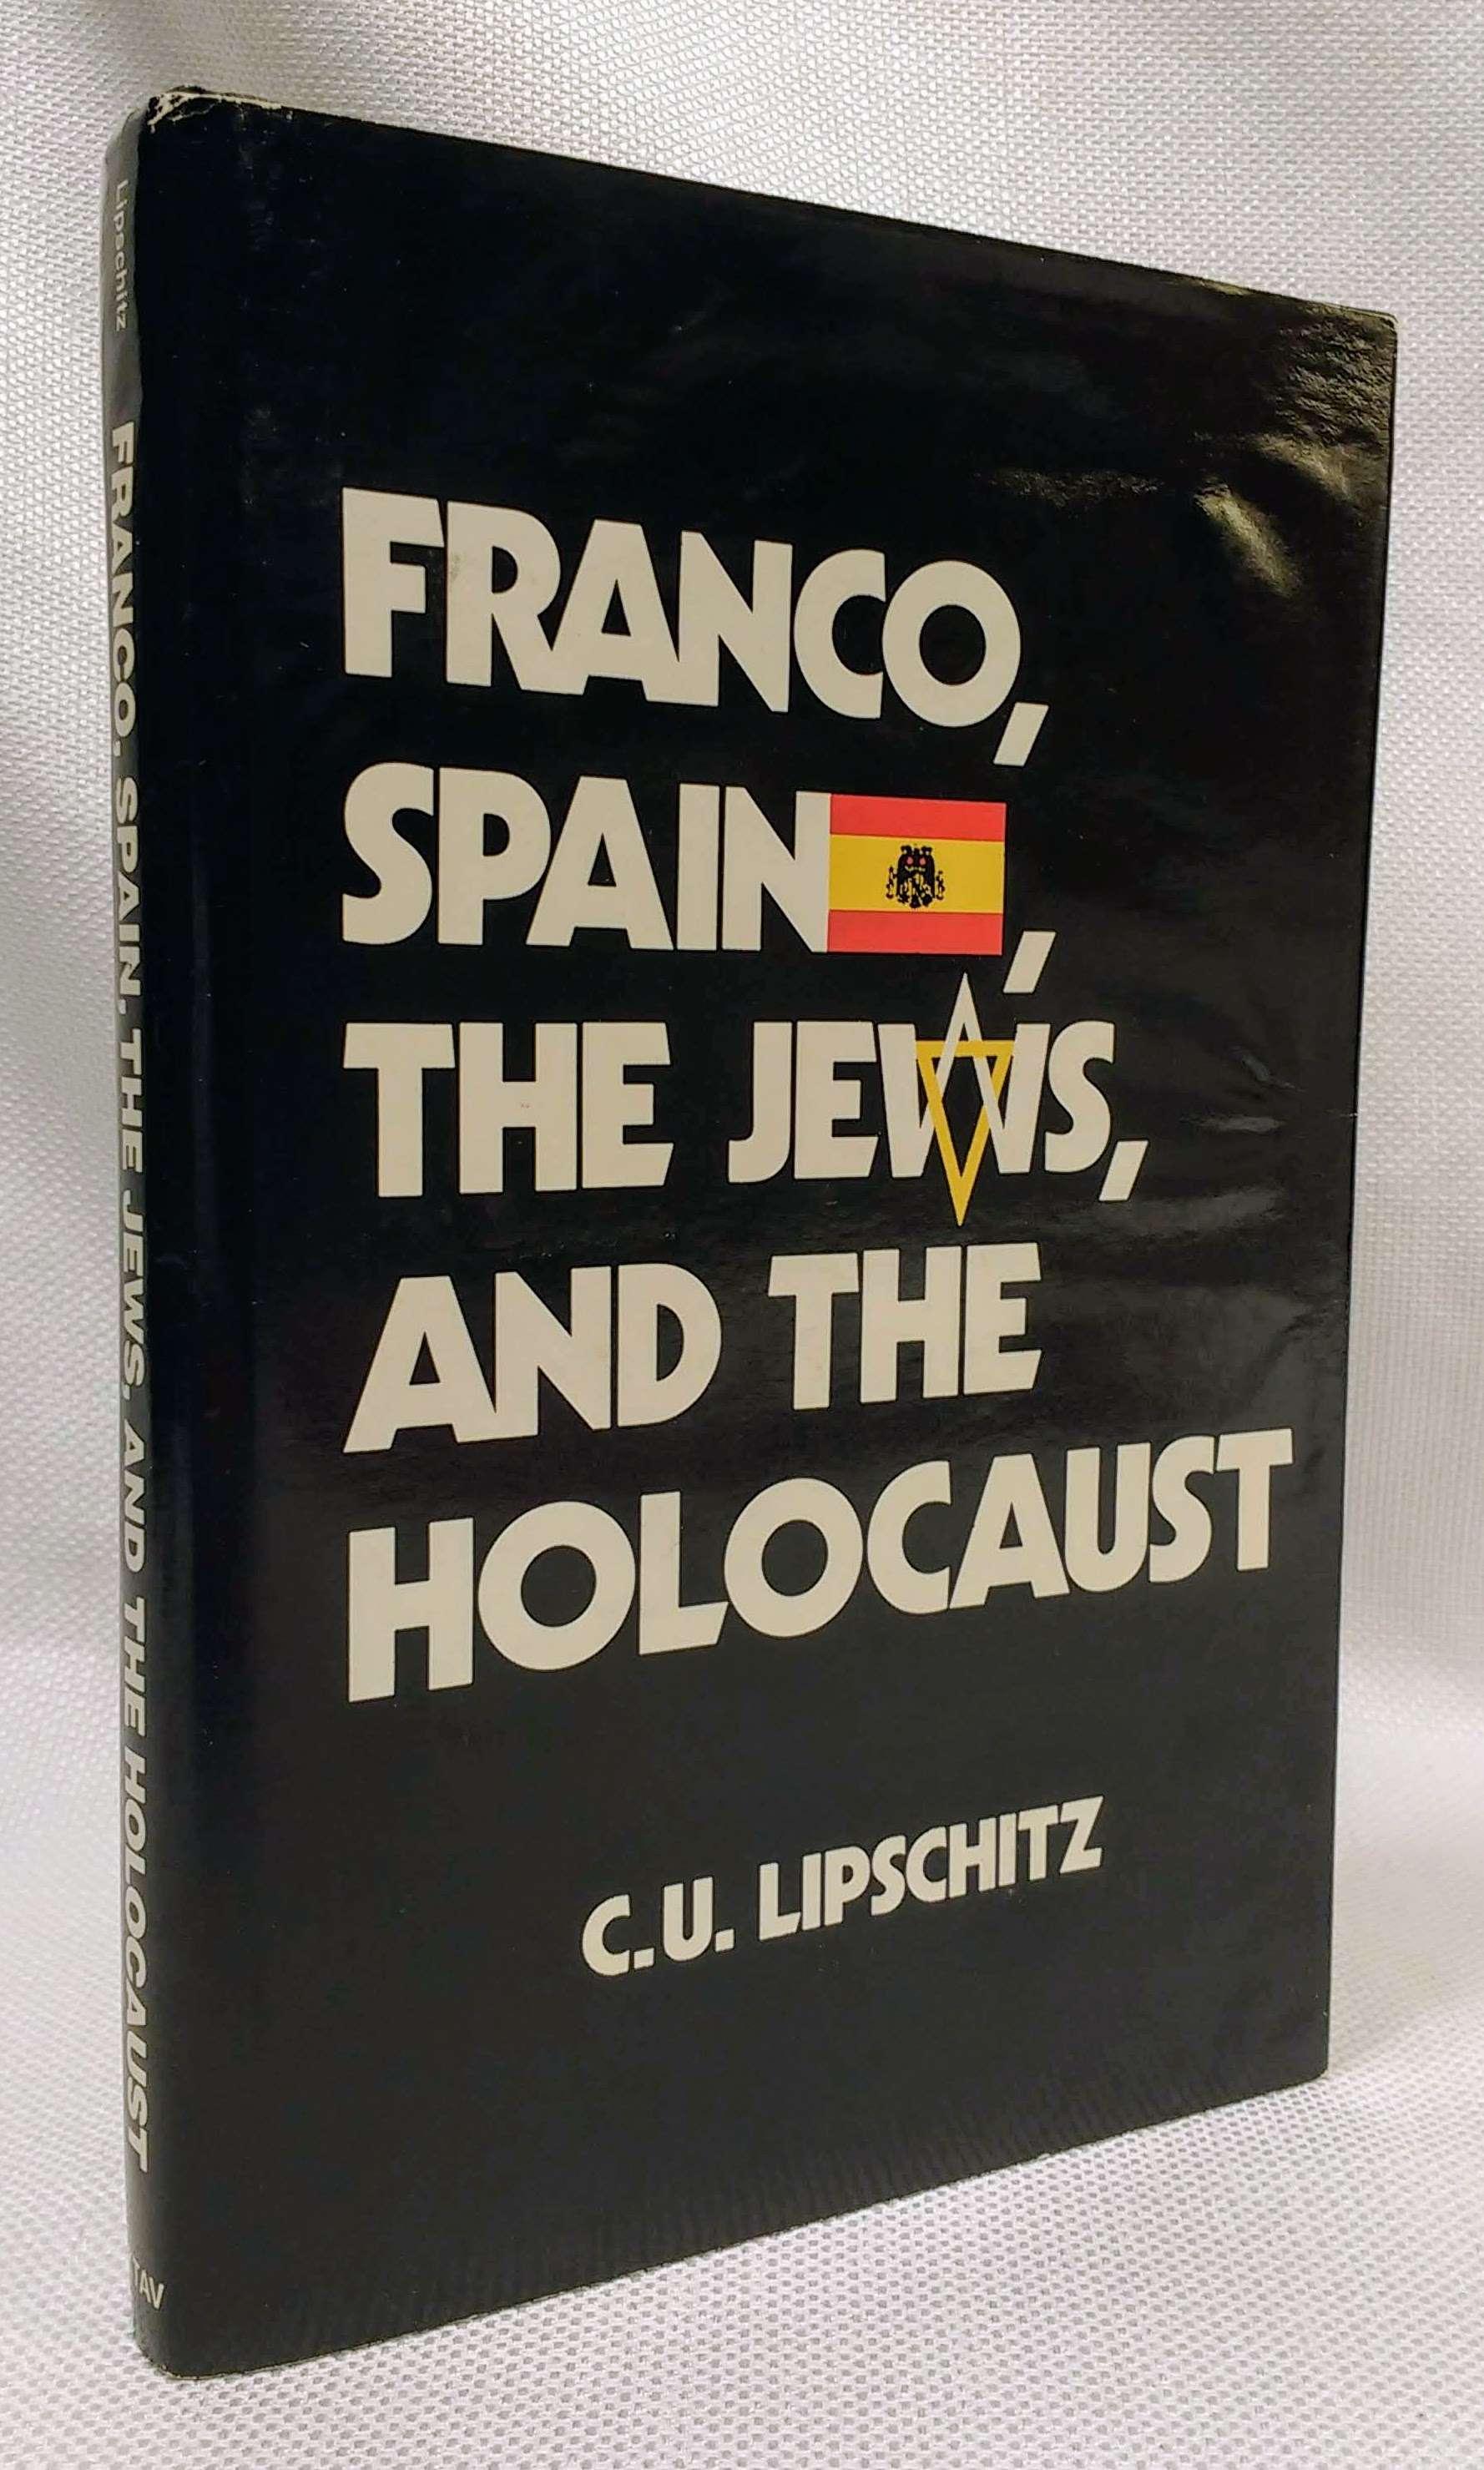 Franco, Spain, the Jews, and the Holocaust, Lipschitz, Chaim U.